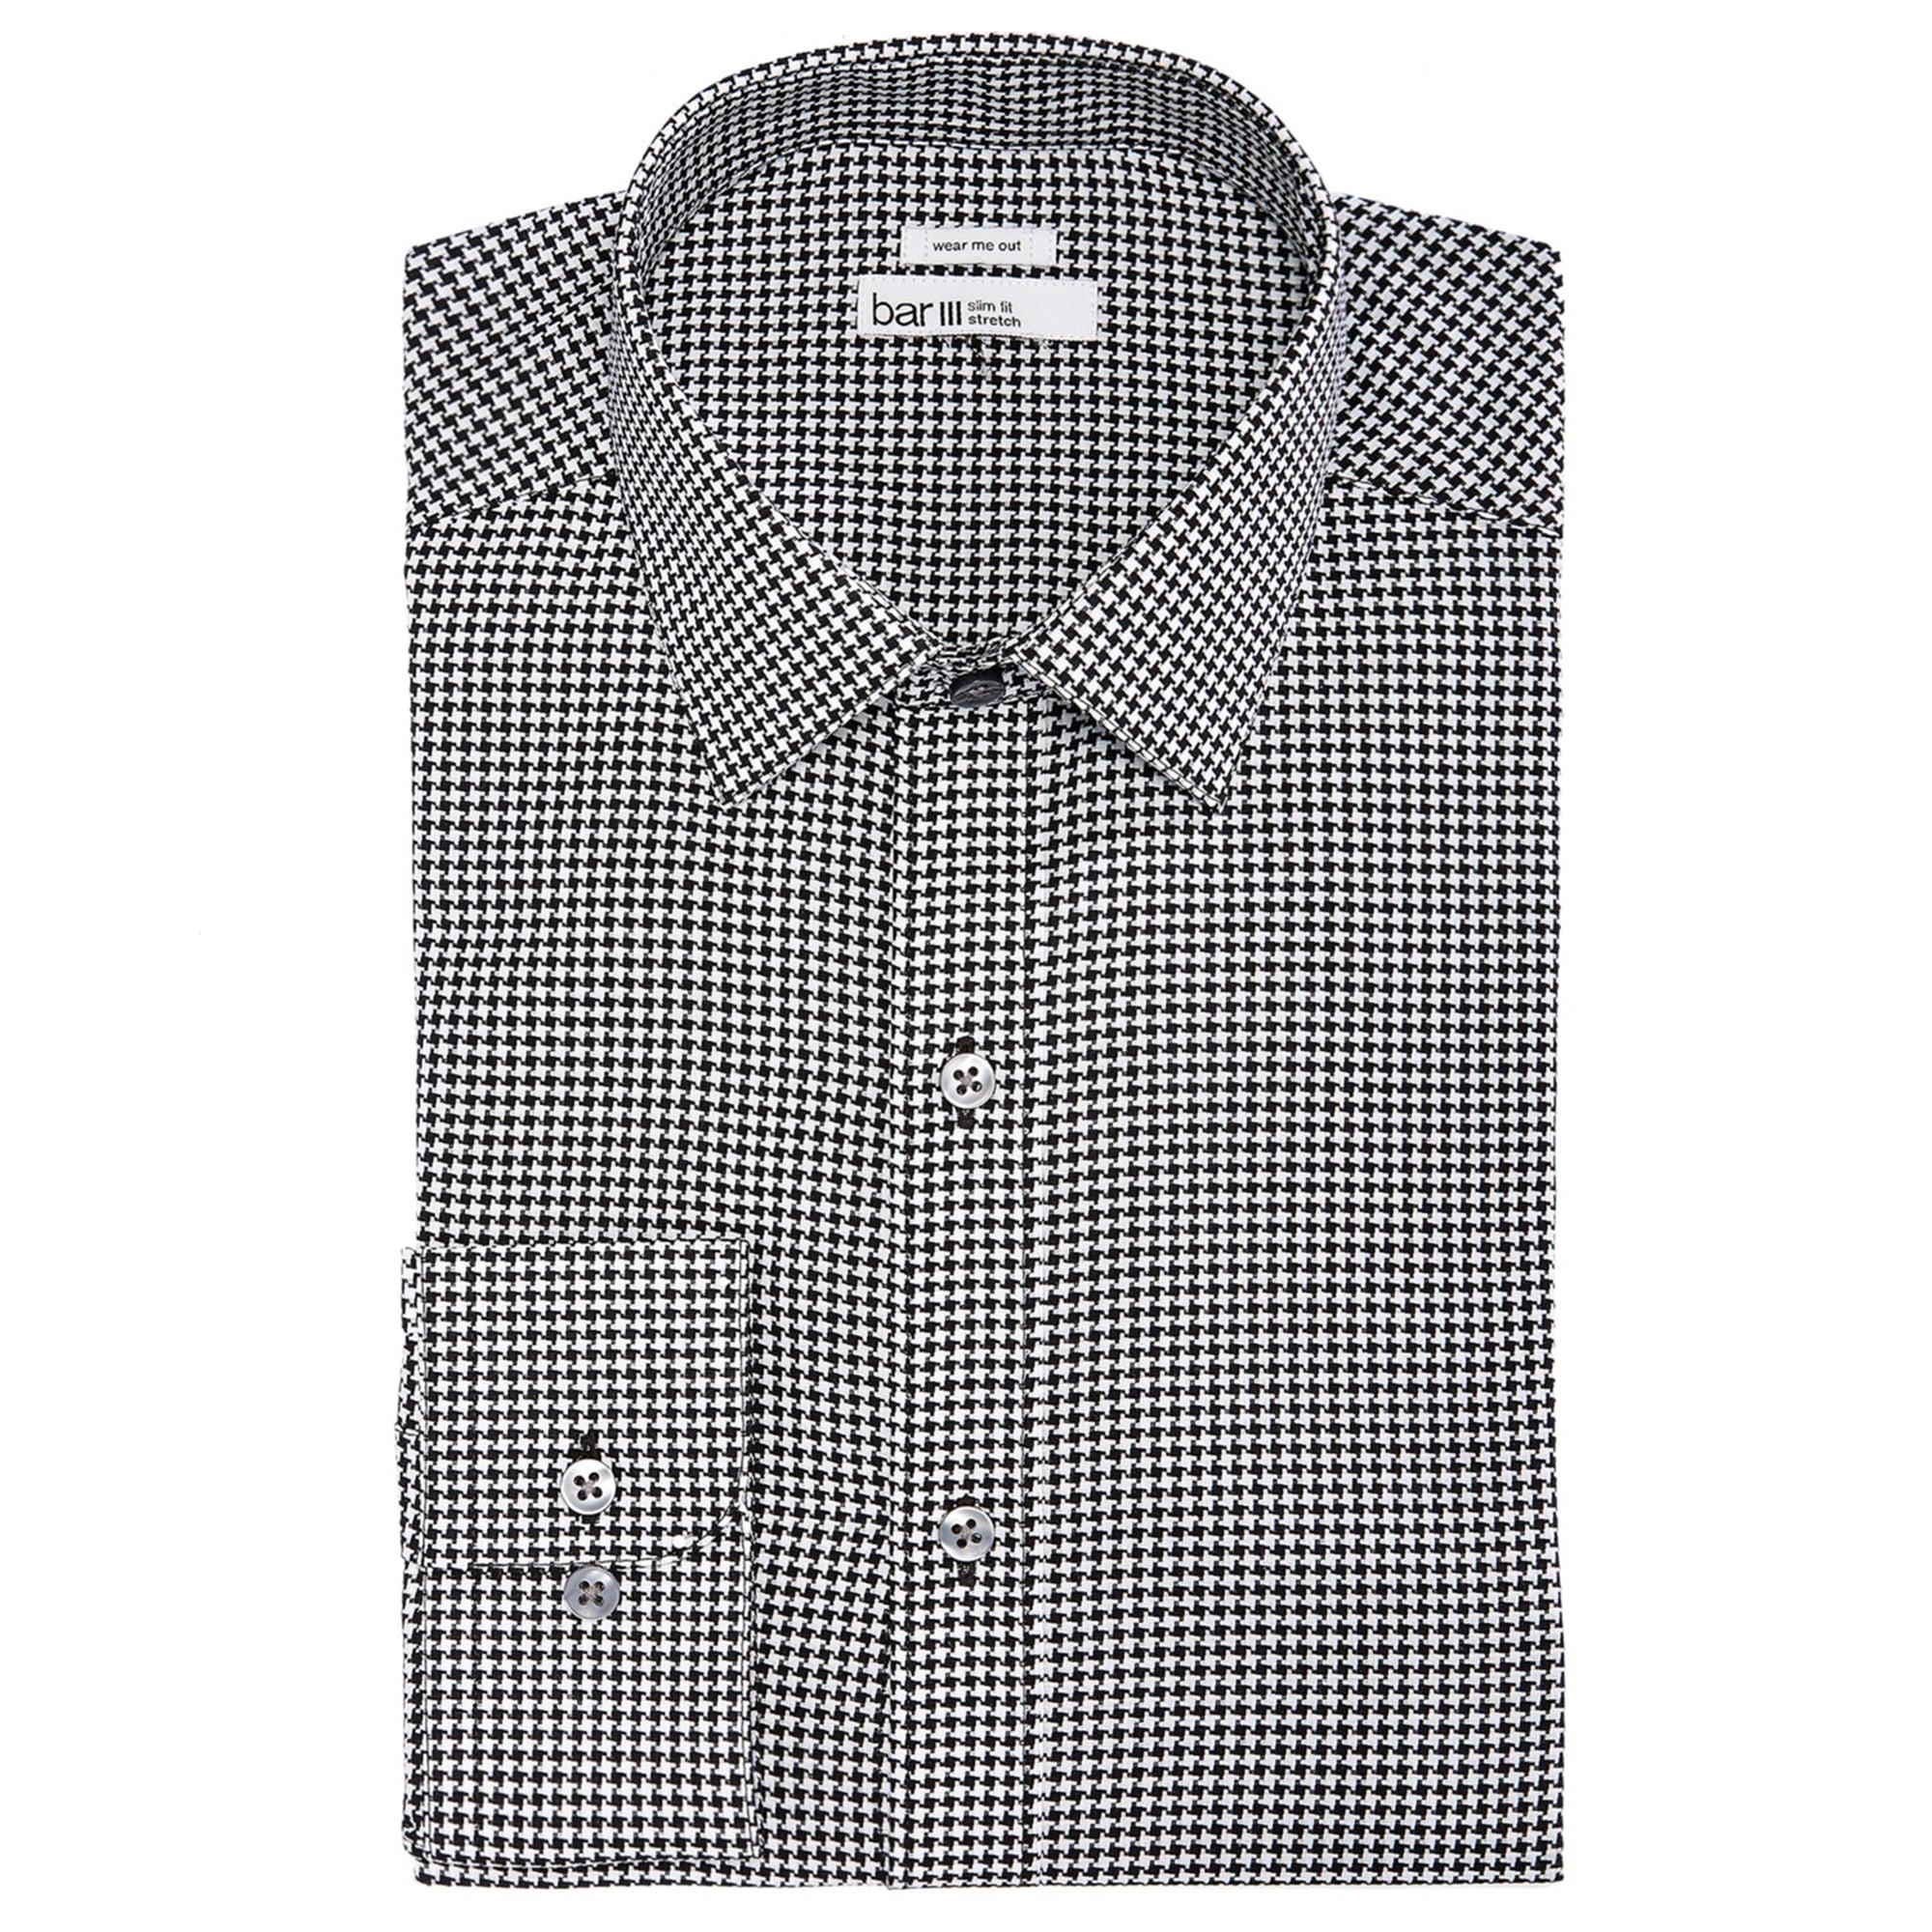 Bar III Mens Slim-Fit Stretch Max White Solid Dress Shirt